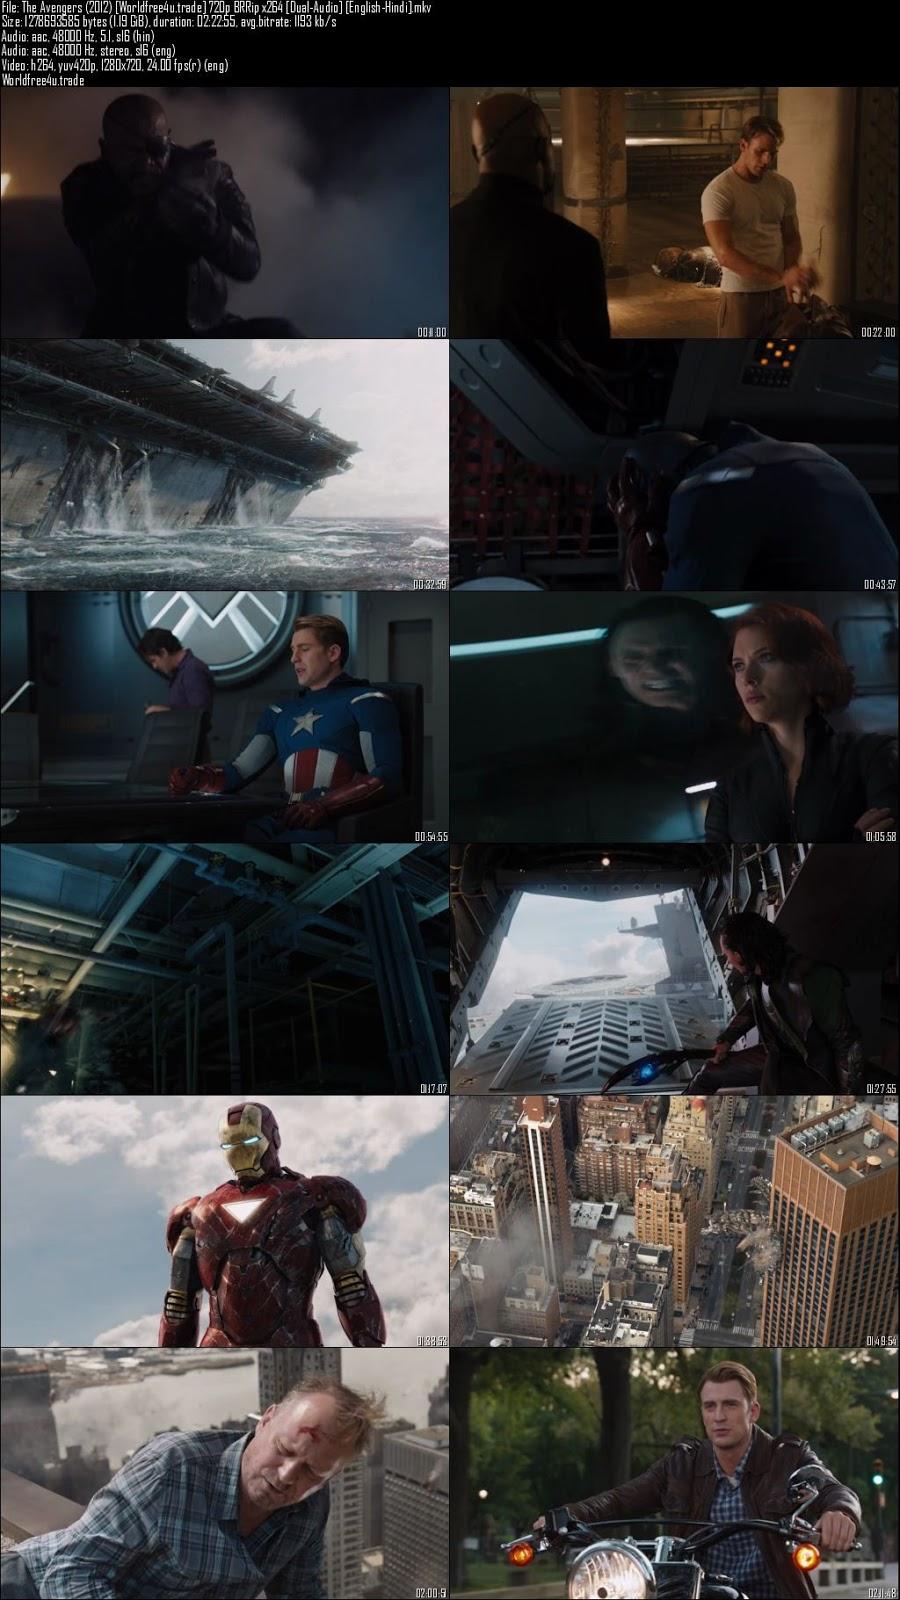 Screen Shoot of The Avengers 2012 BRRip 1080p Dual Audio Hindi English